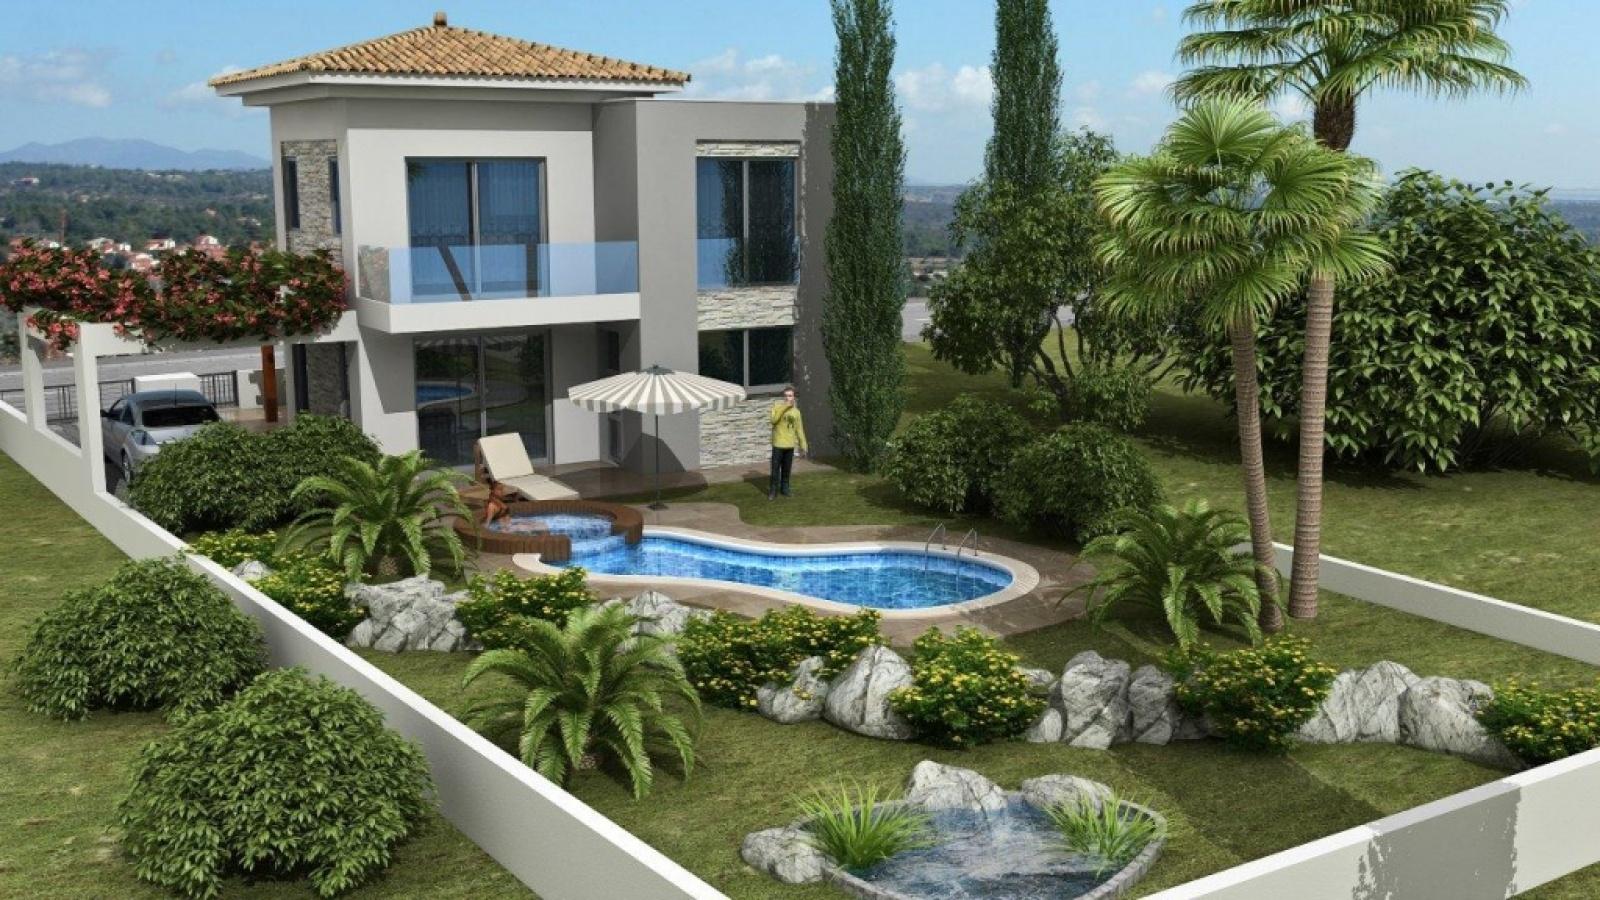 Residential Villa - SUNRISE MONI VILLAS